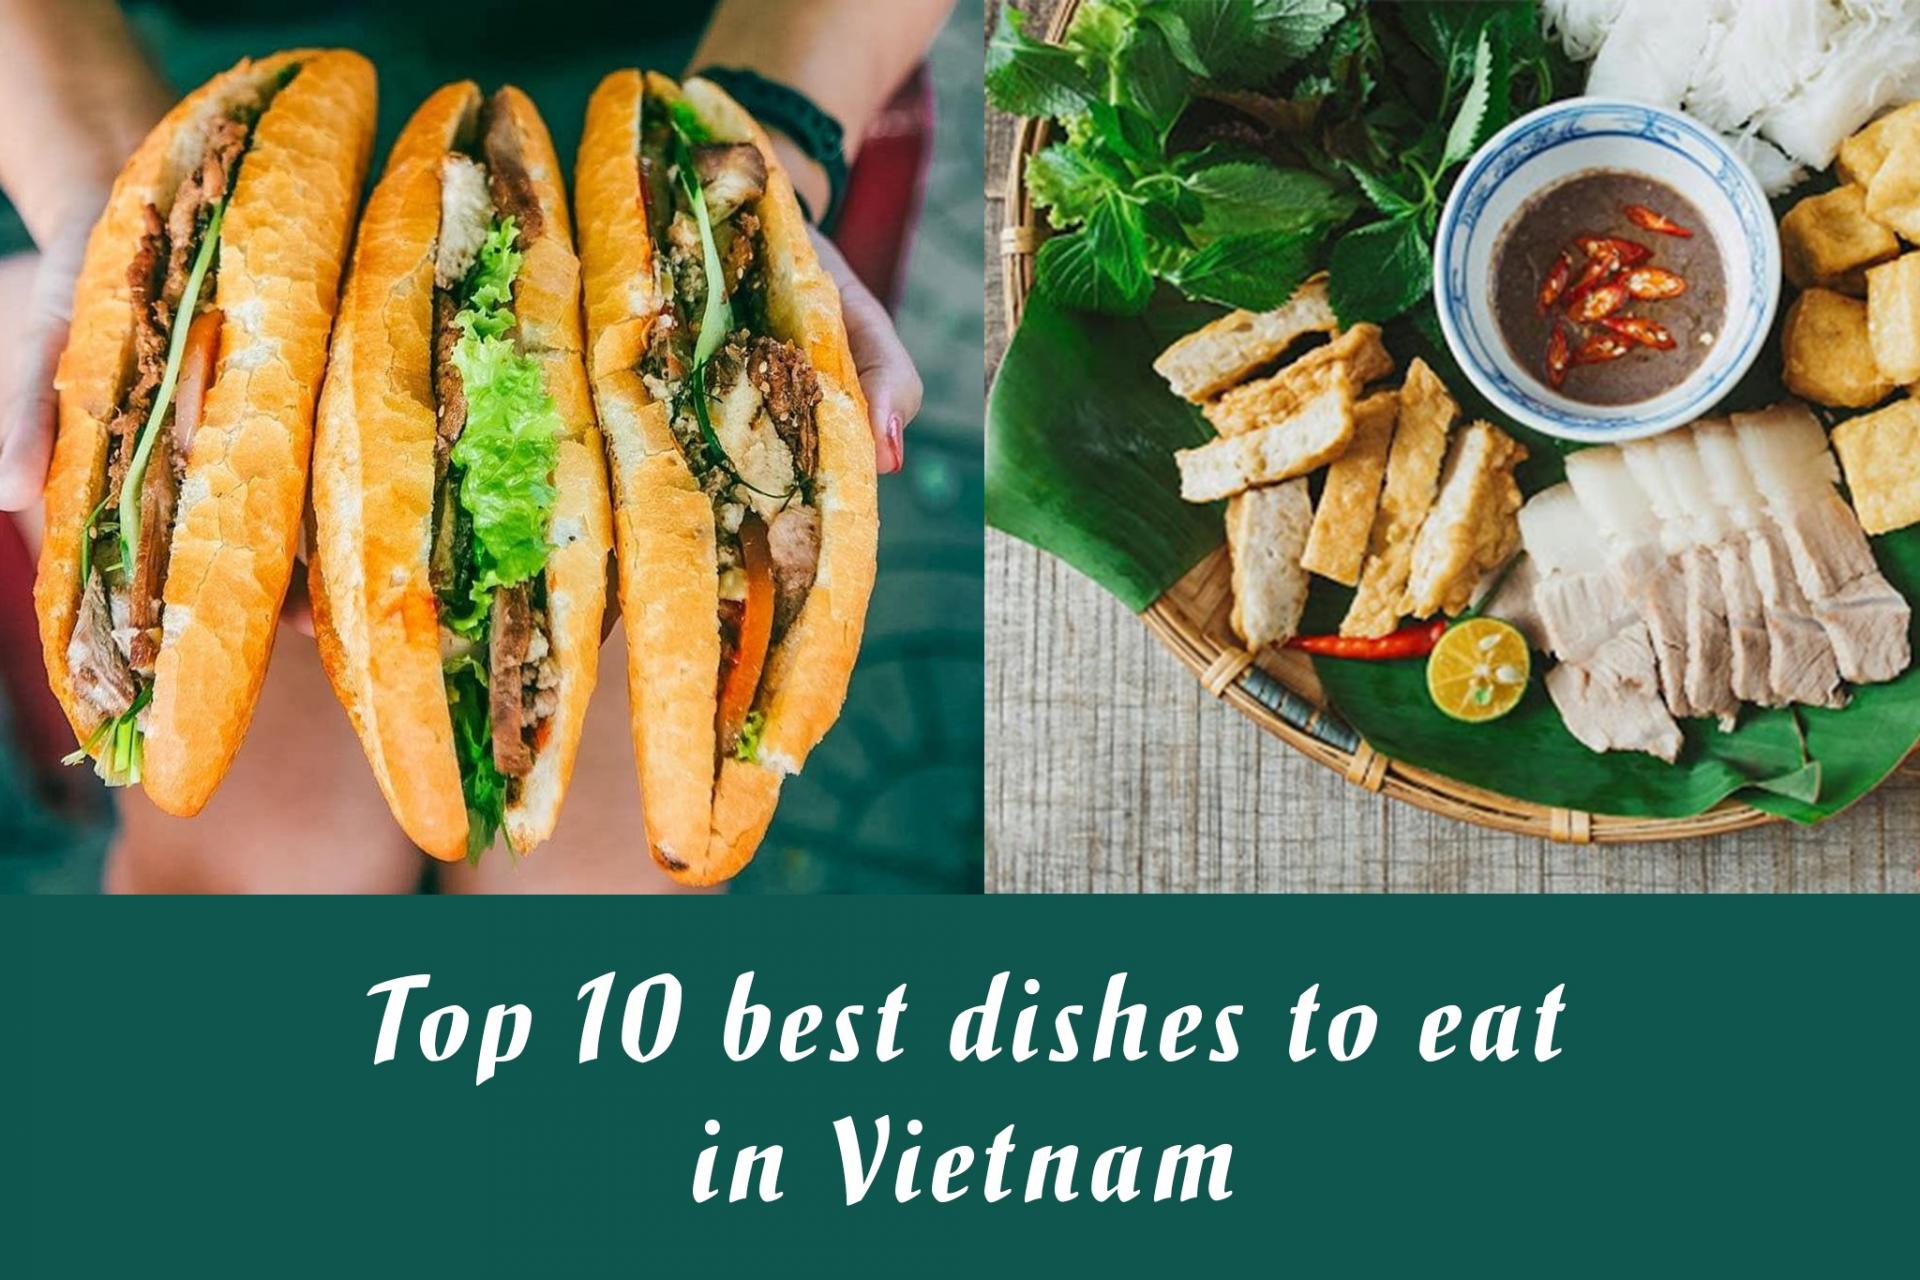 Top 10 Best Dishes in Vietnam - Video